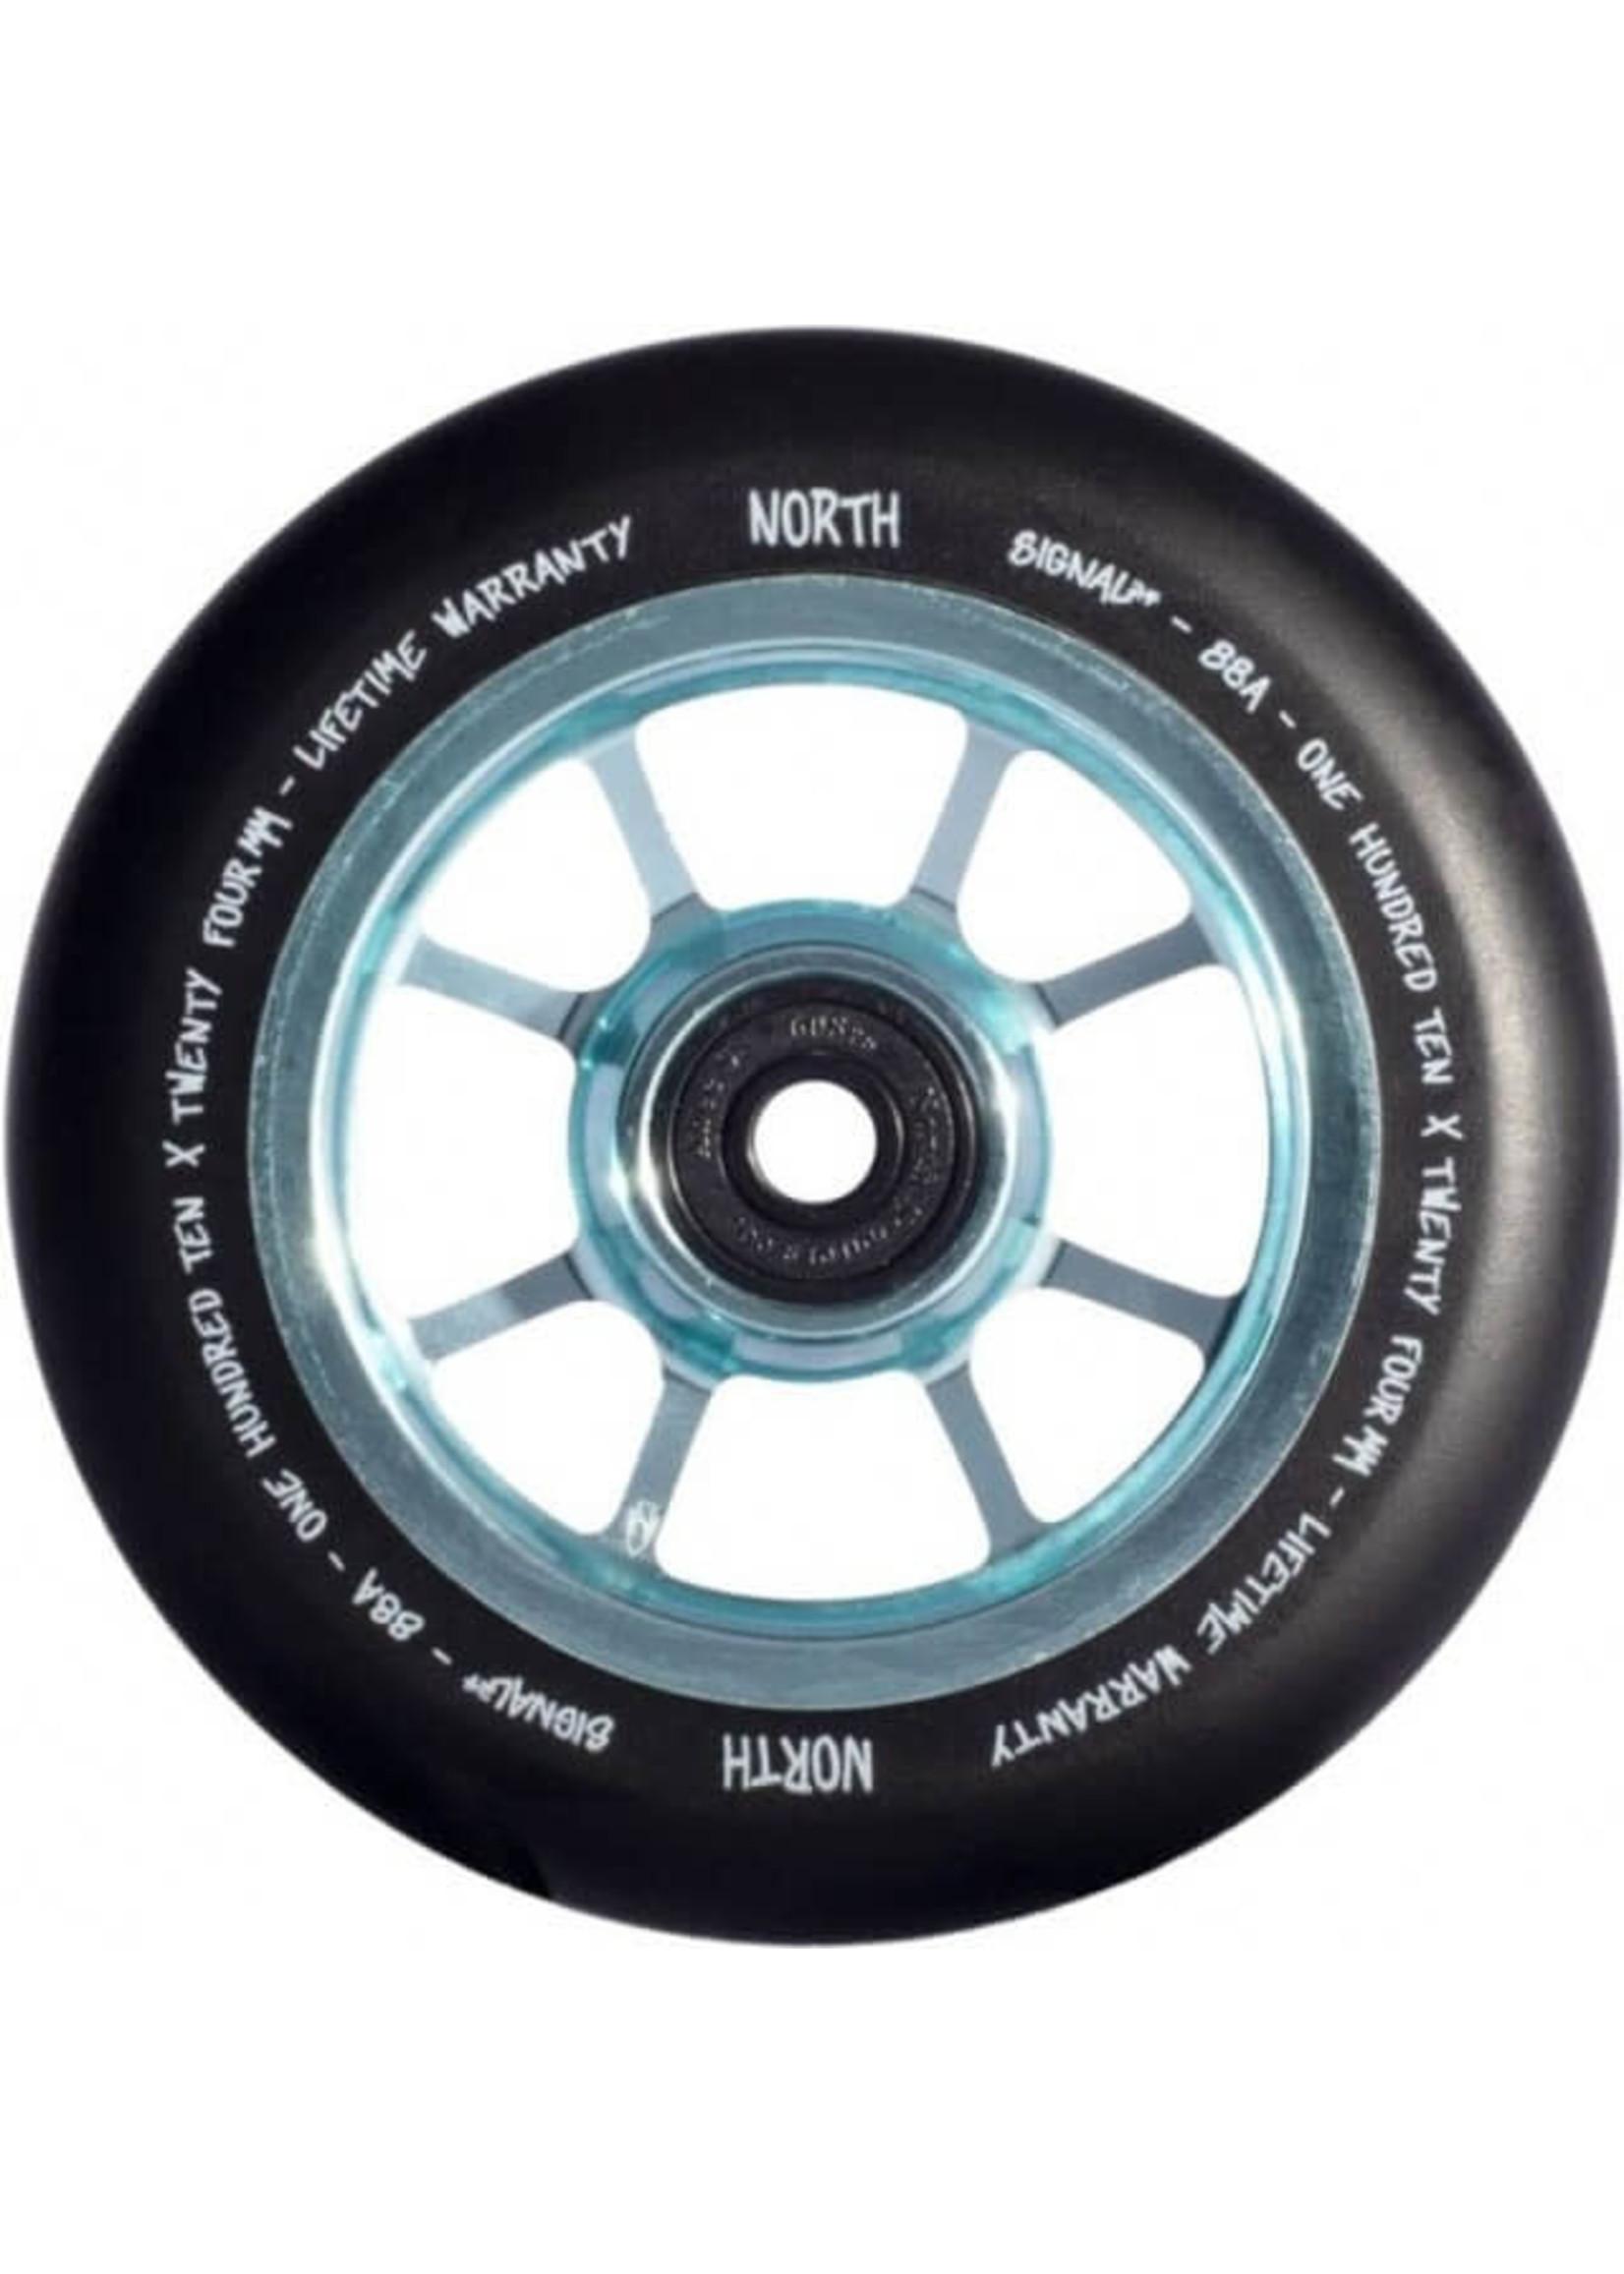 North North -  Signal Wheels - 110mm